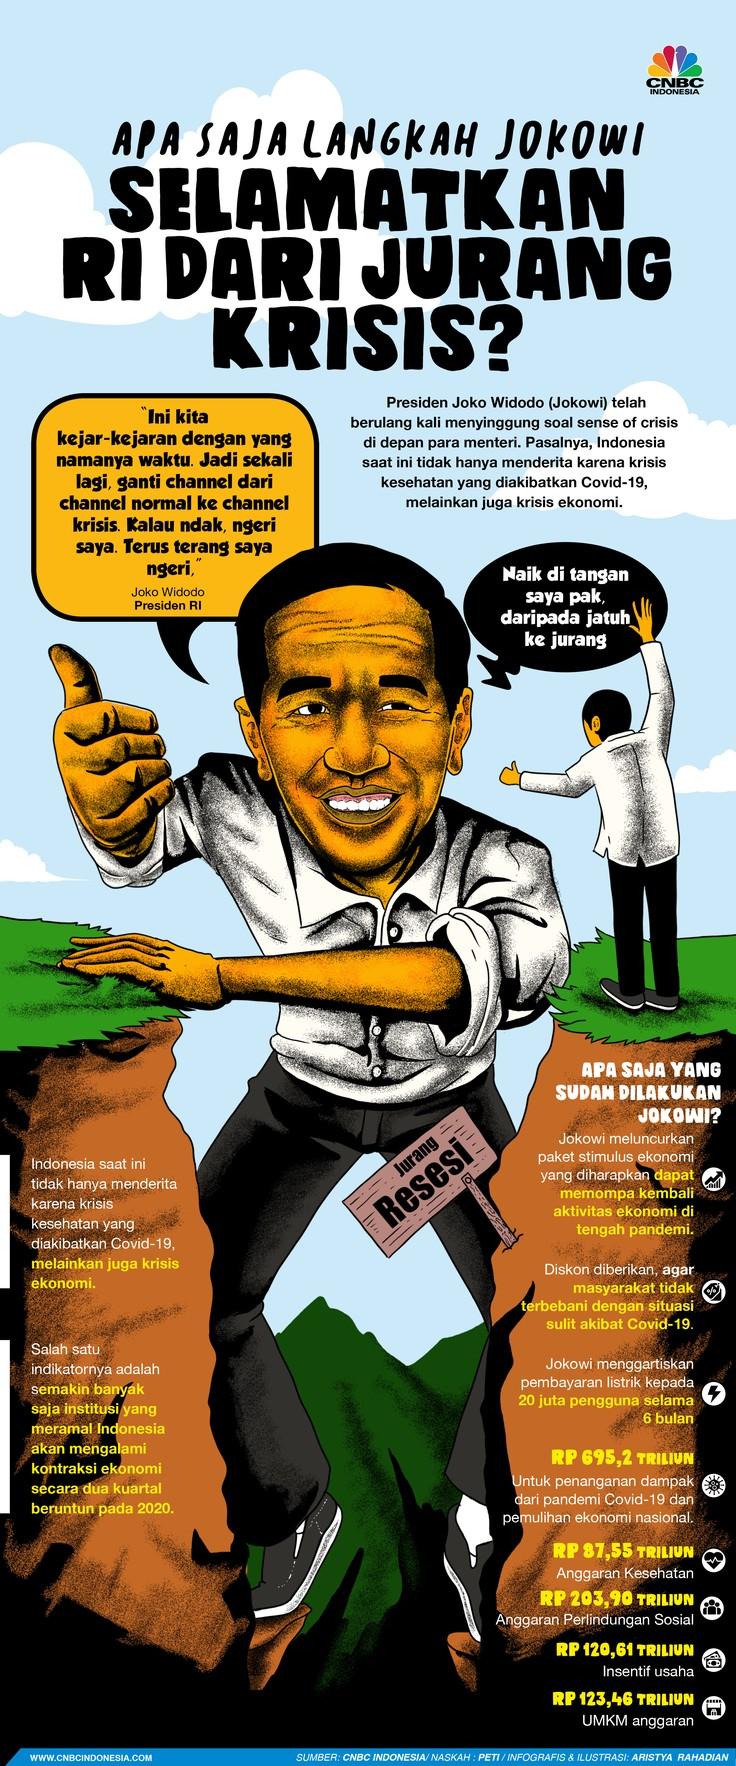 Infografis/Apa Saja Langkah Jokowi Selamatkan RI dari Jurang Krisis?